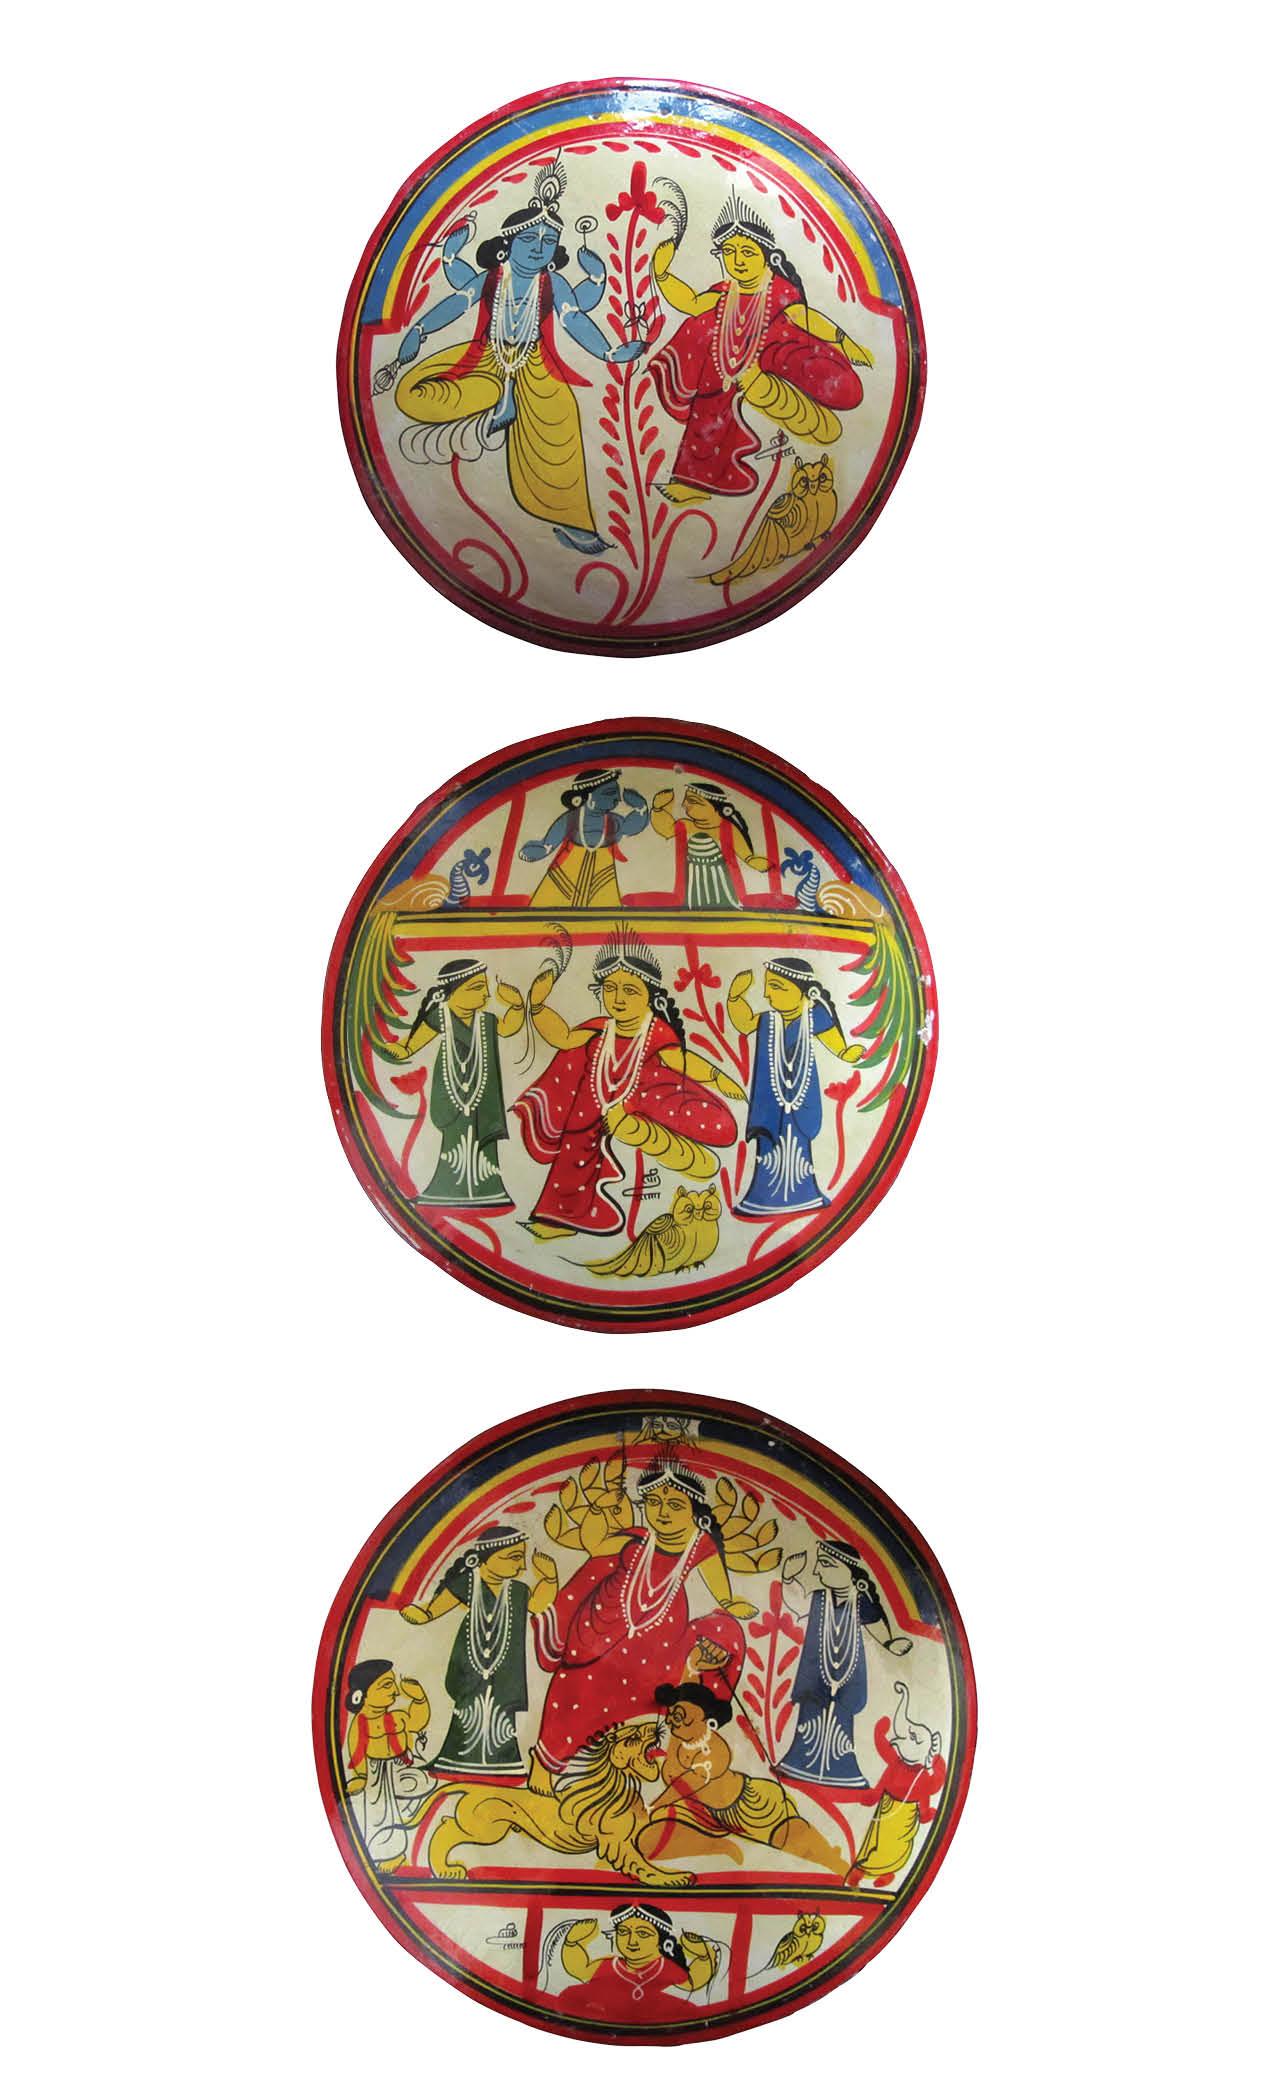 Lakshmi-Narayan Sara, Lakshmi Sara and Mahisasurmardini Sara, West Bengal, painted terracotta, Dia. 29 cm, Purchased near Kalighat Temple, Calcutta (2019).